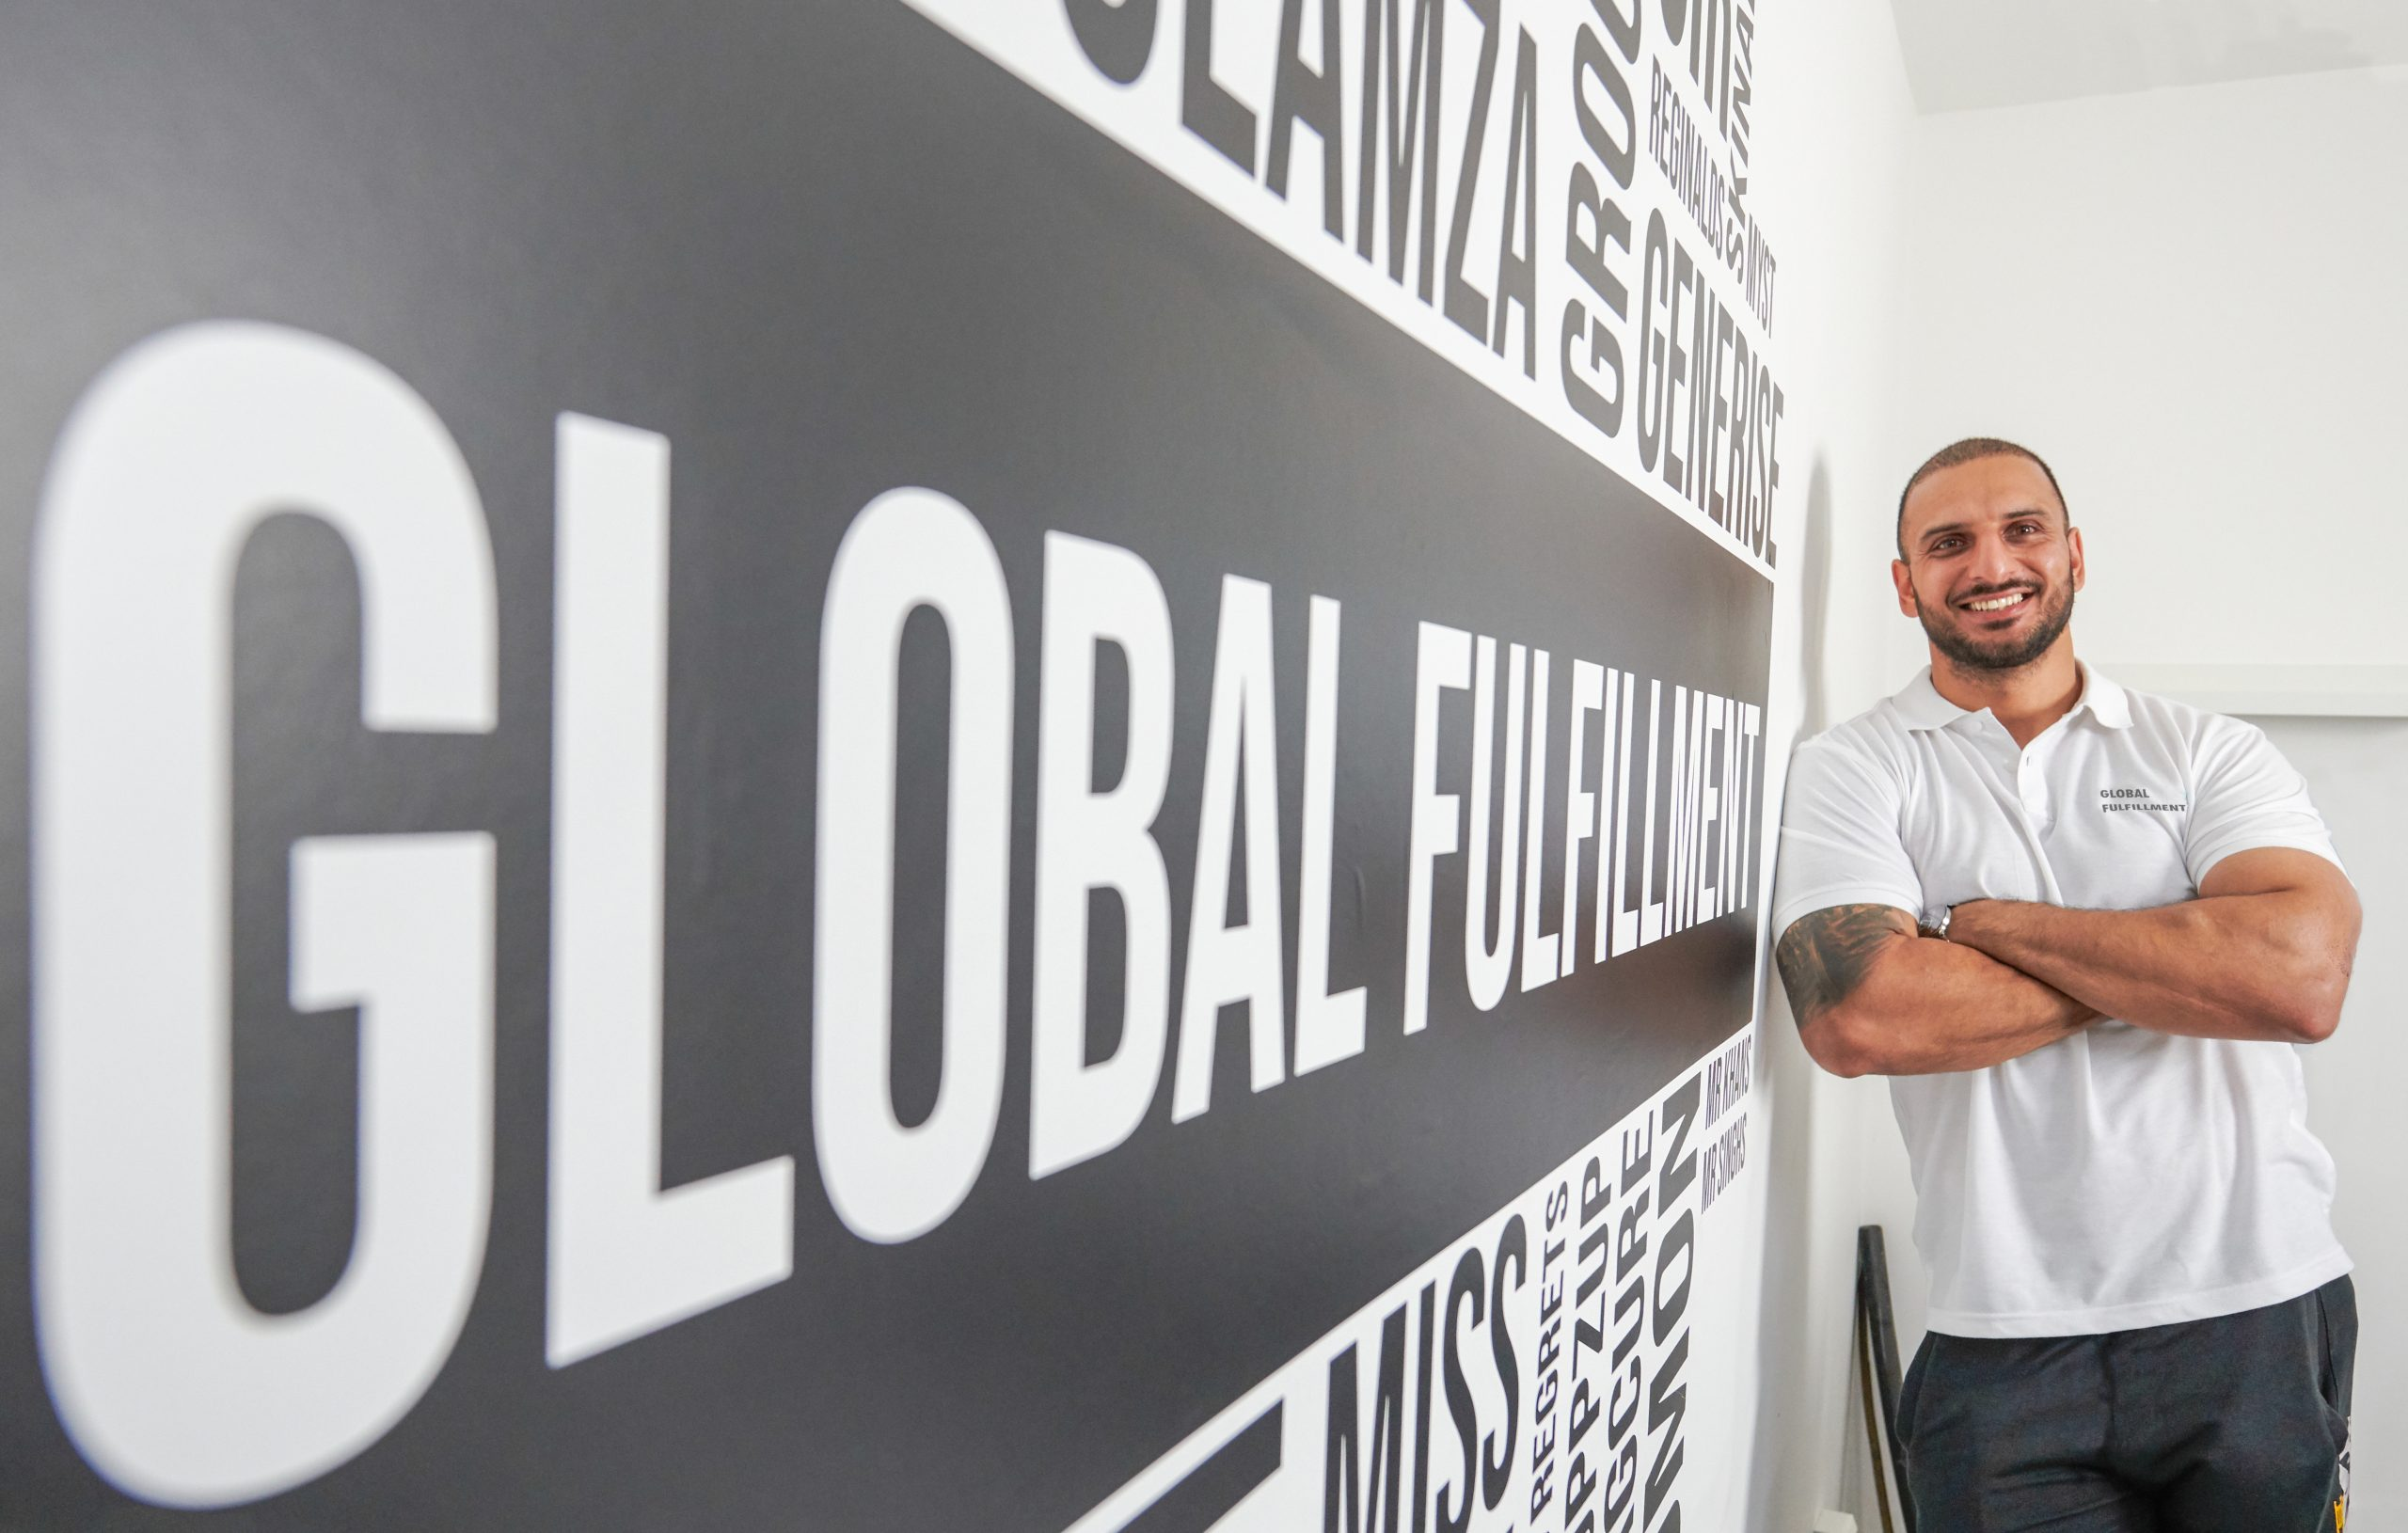 Sunny Rai, Founder of Global Fulfillment